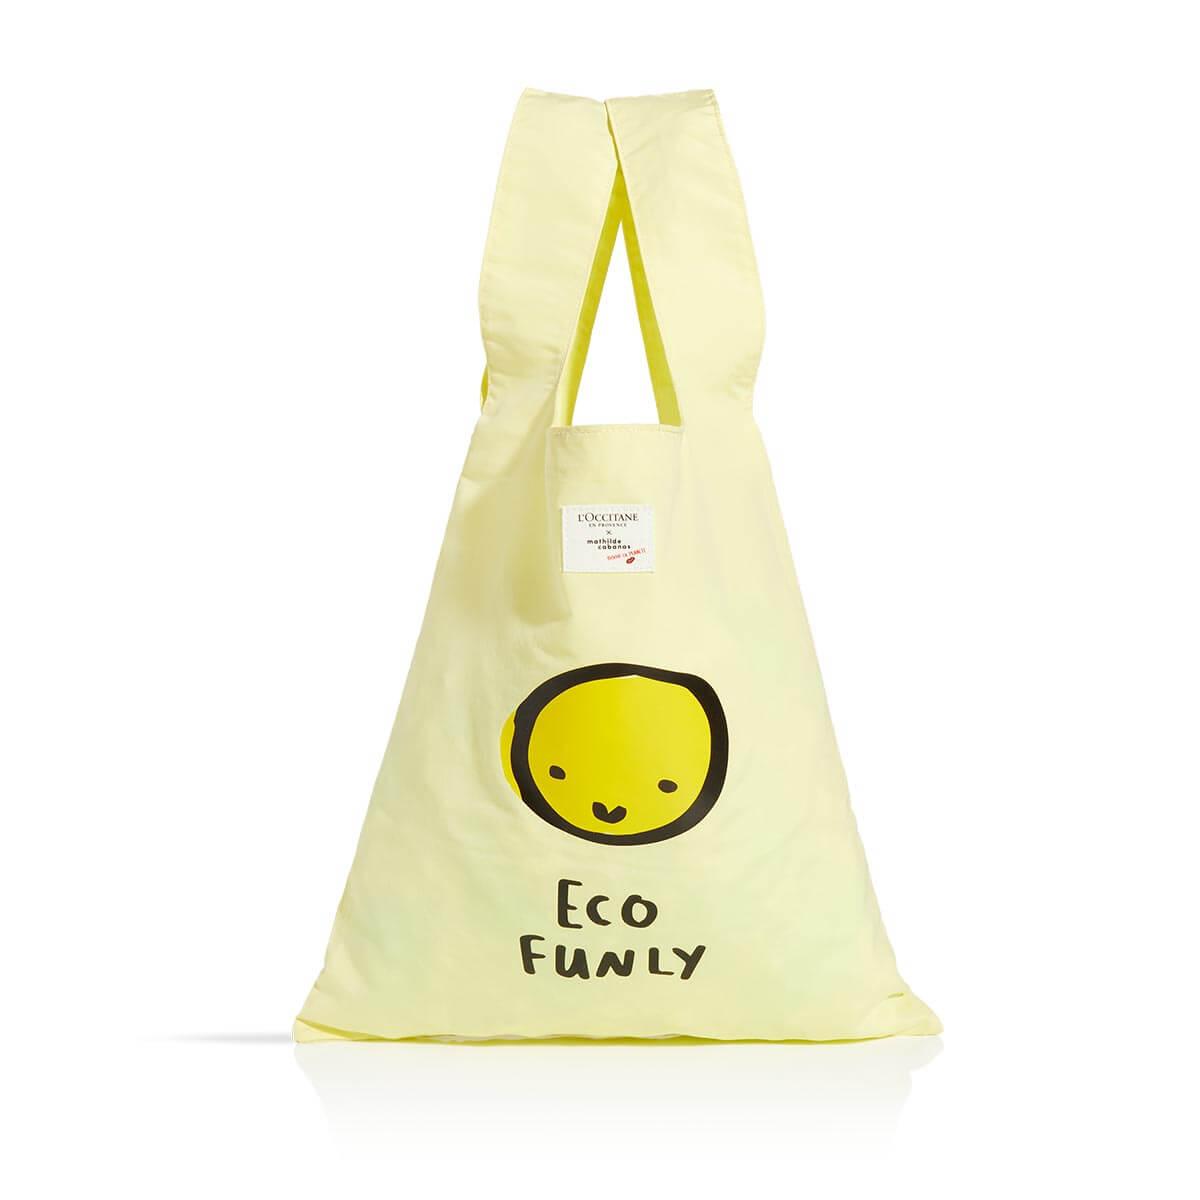 The L'OCCITANE shopping bag